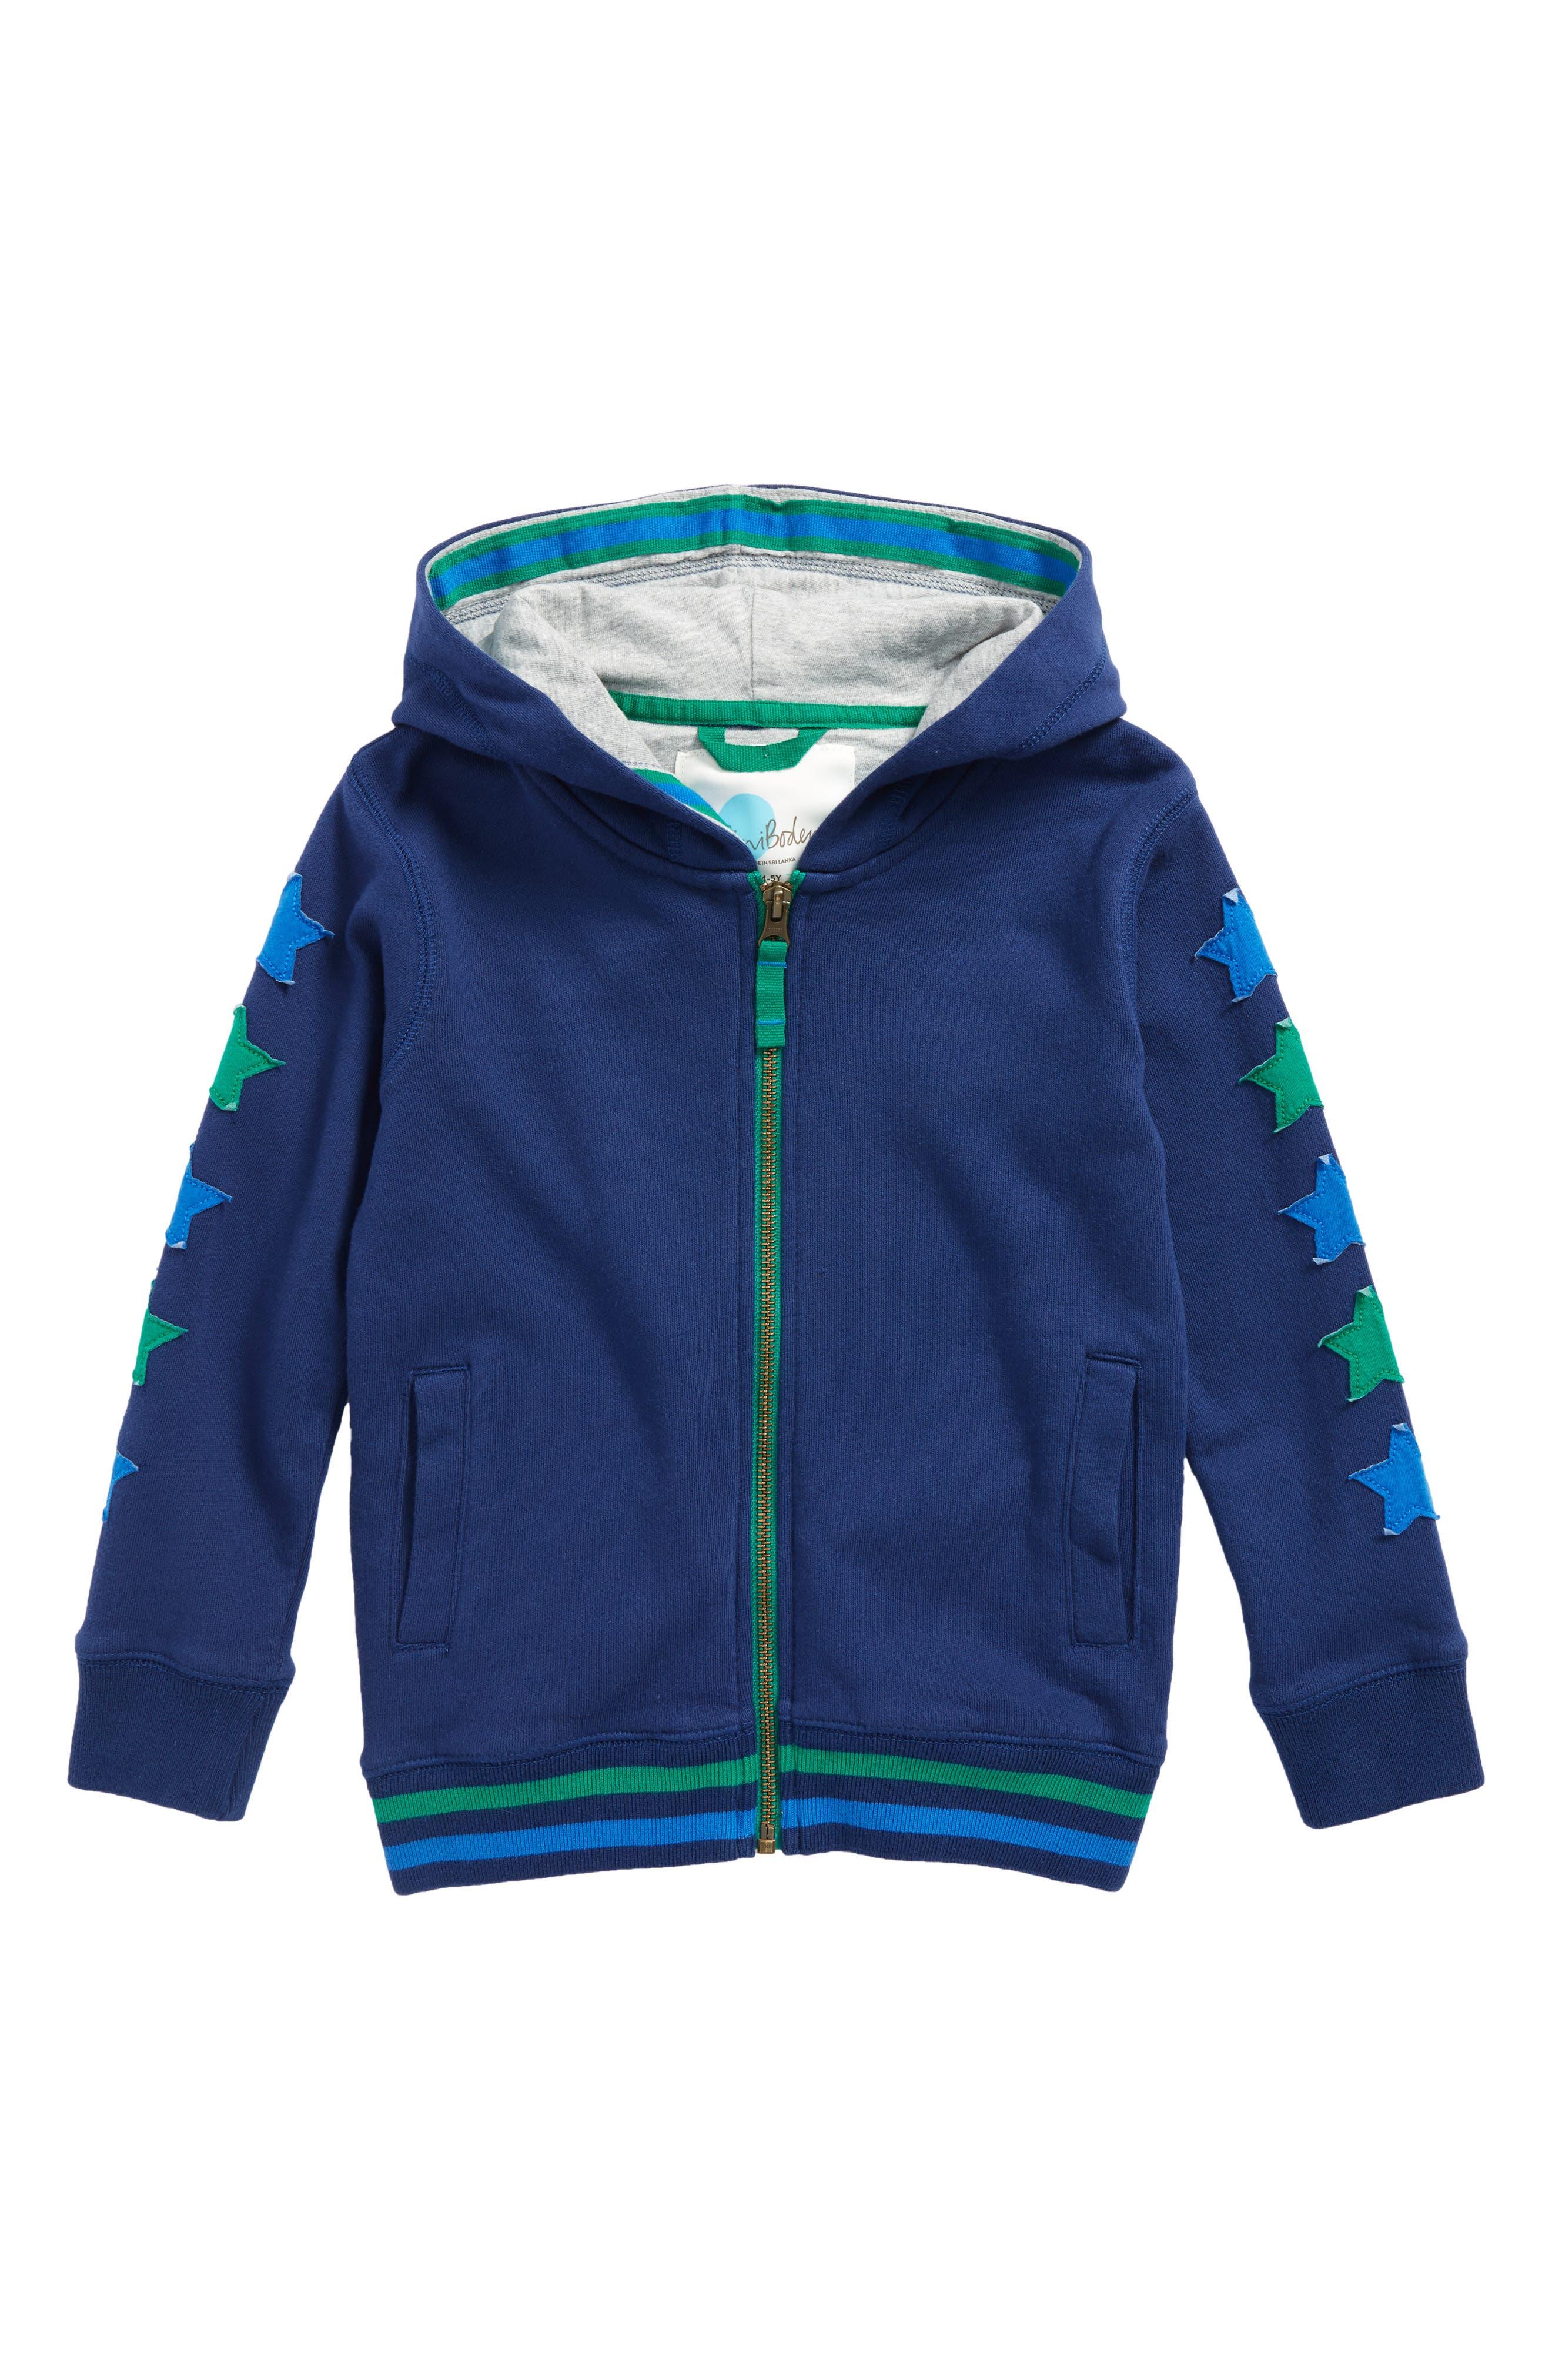 Starry Zip Hoodie,                         Main,                         color,